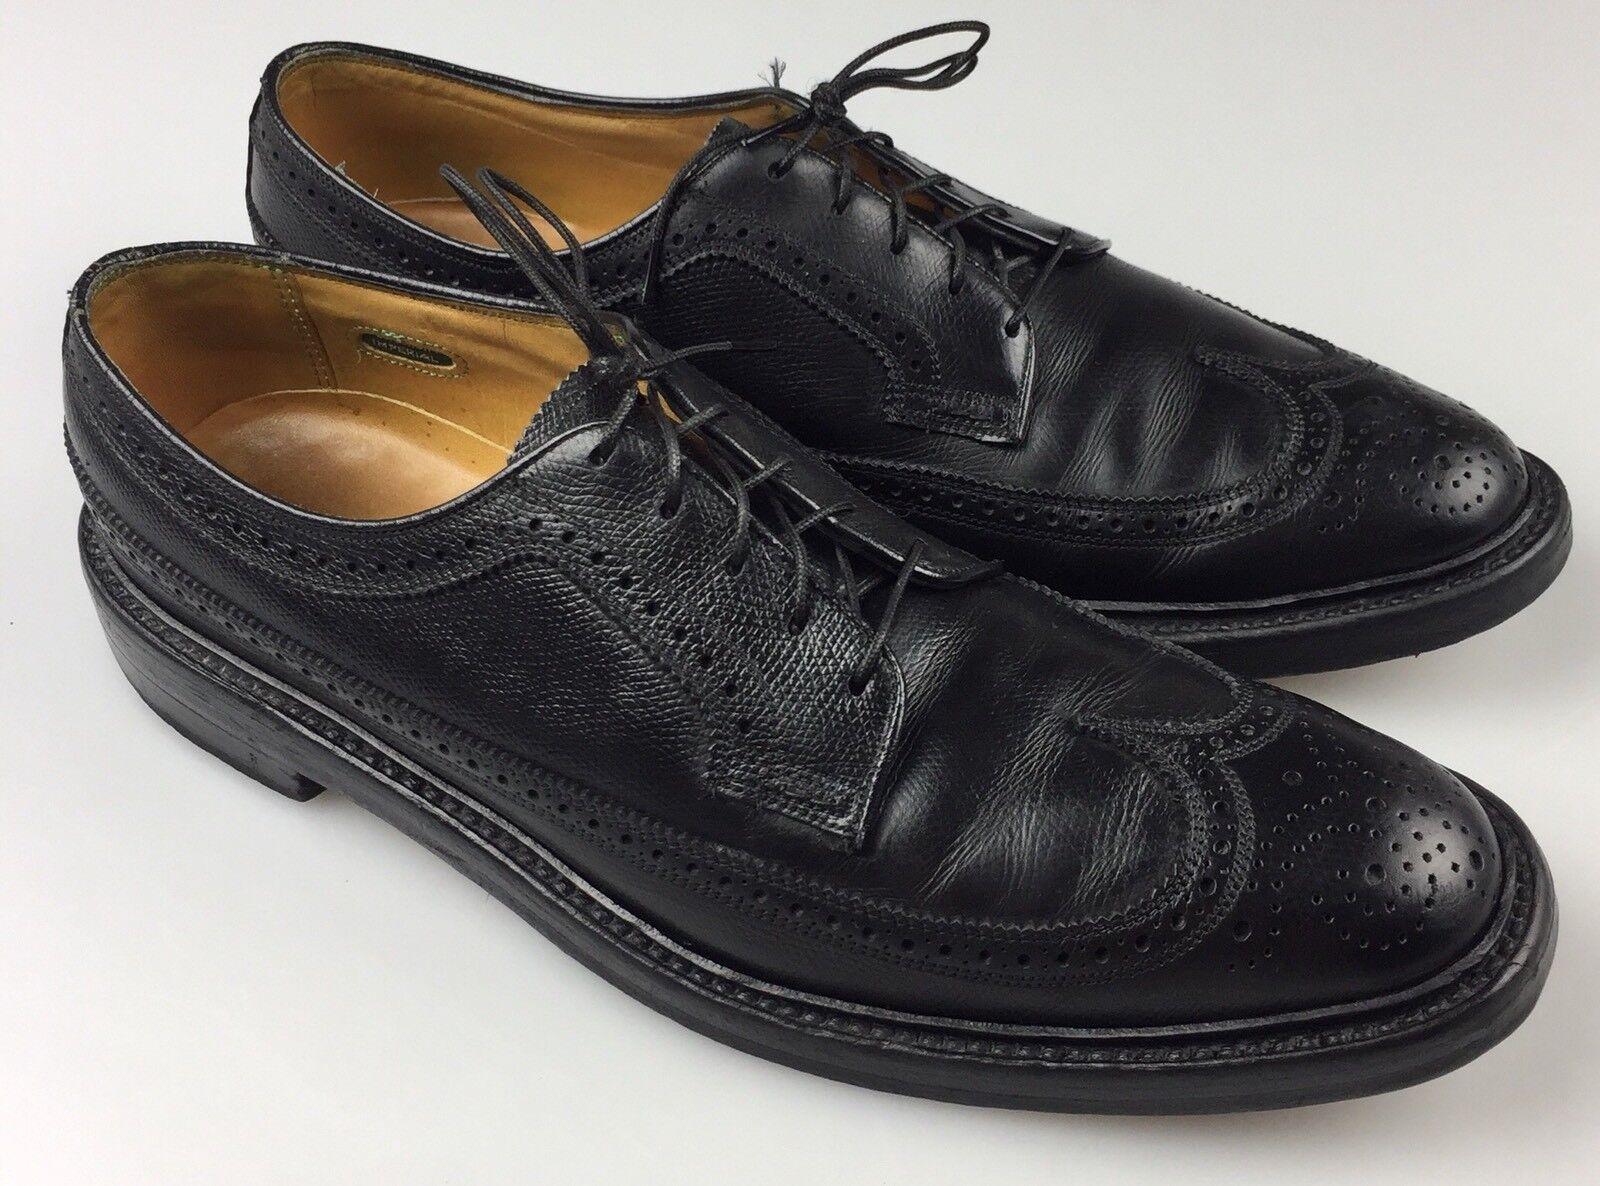 Vintage Florsheim Imperial V Cleat 5 Nail Wingtips Black Leather Men's 10.5 A